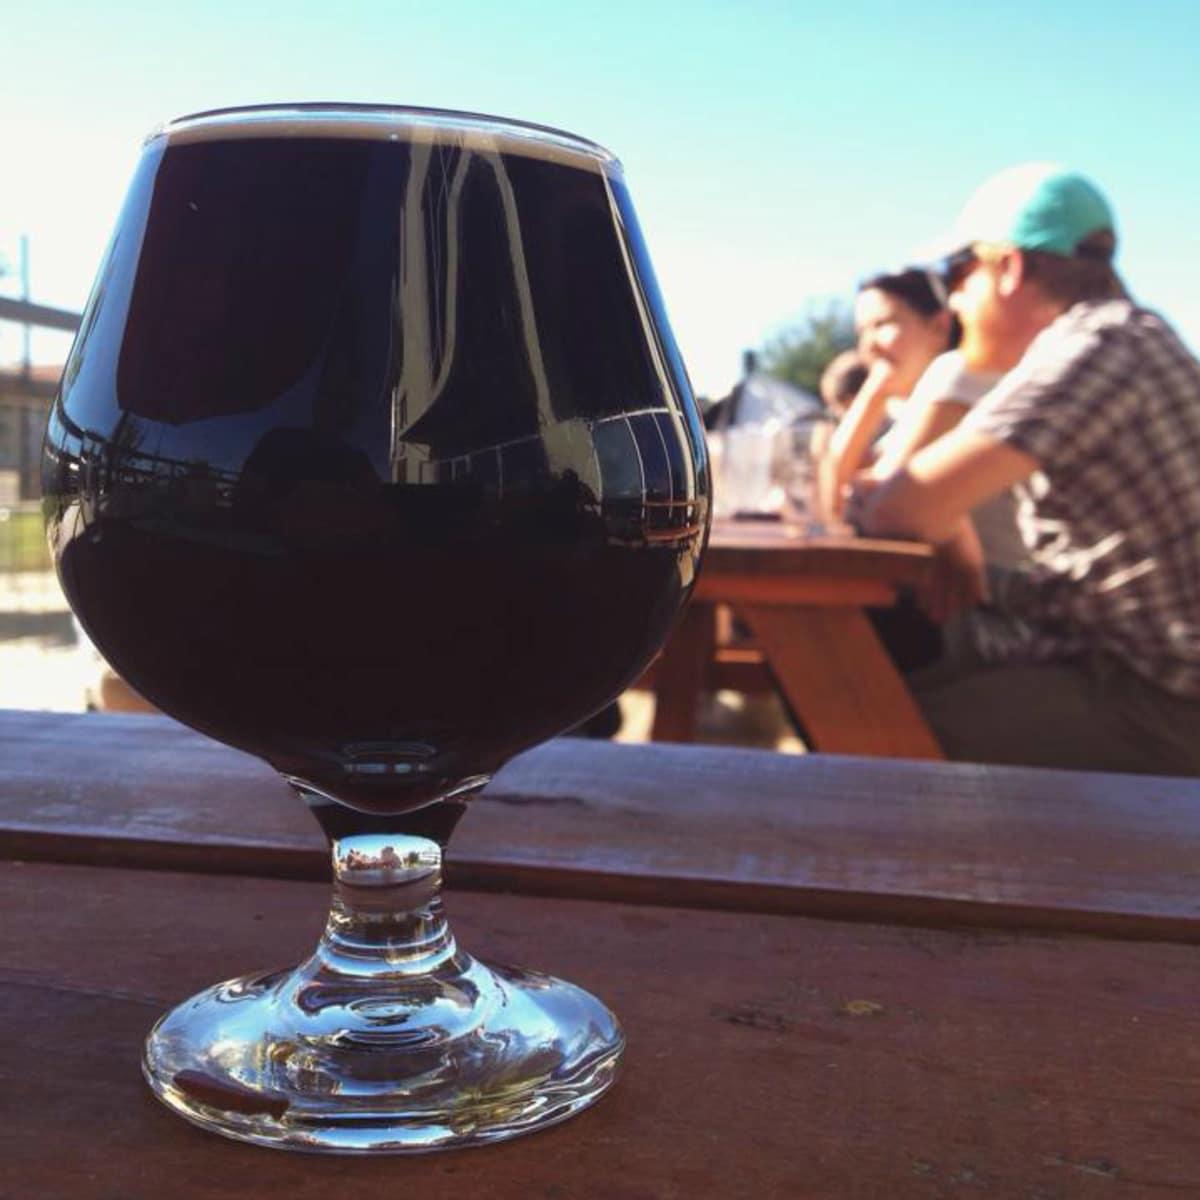 Black Star Co-op brewery pub Austin restaurant beer patio 2015